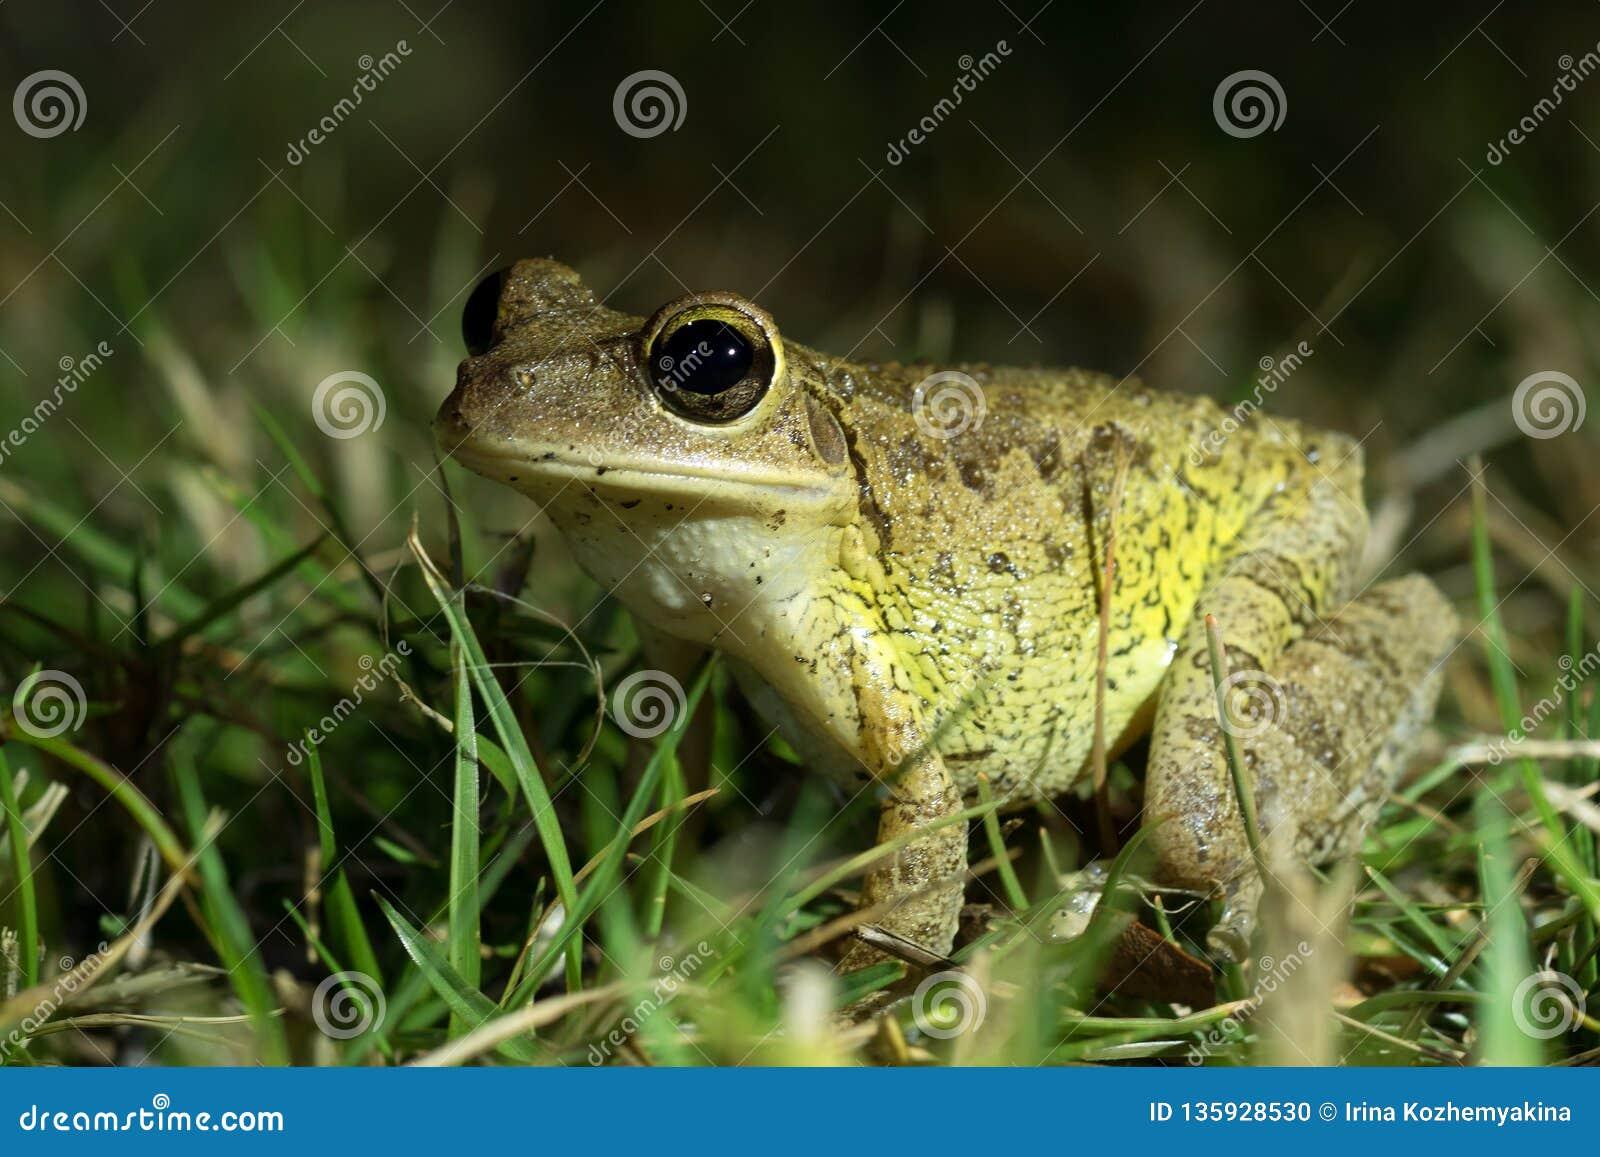 Septentrionalis di Treefrog Osteopilus del cubano in erba Fucilazione di notte Terreni paludosi parco nazionale, Florida, Stati U